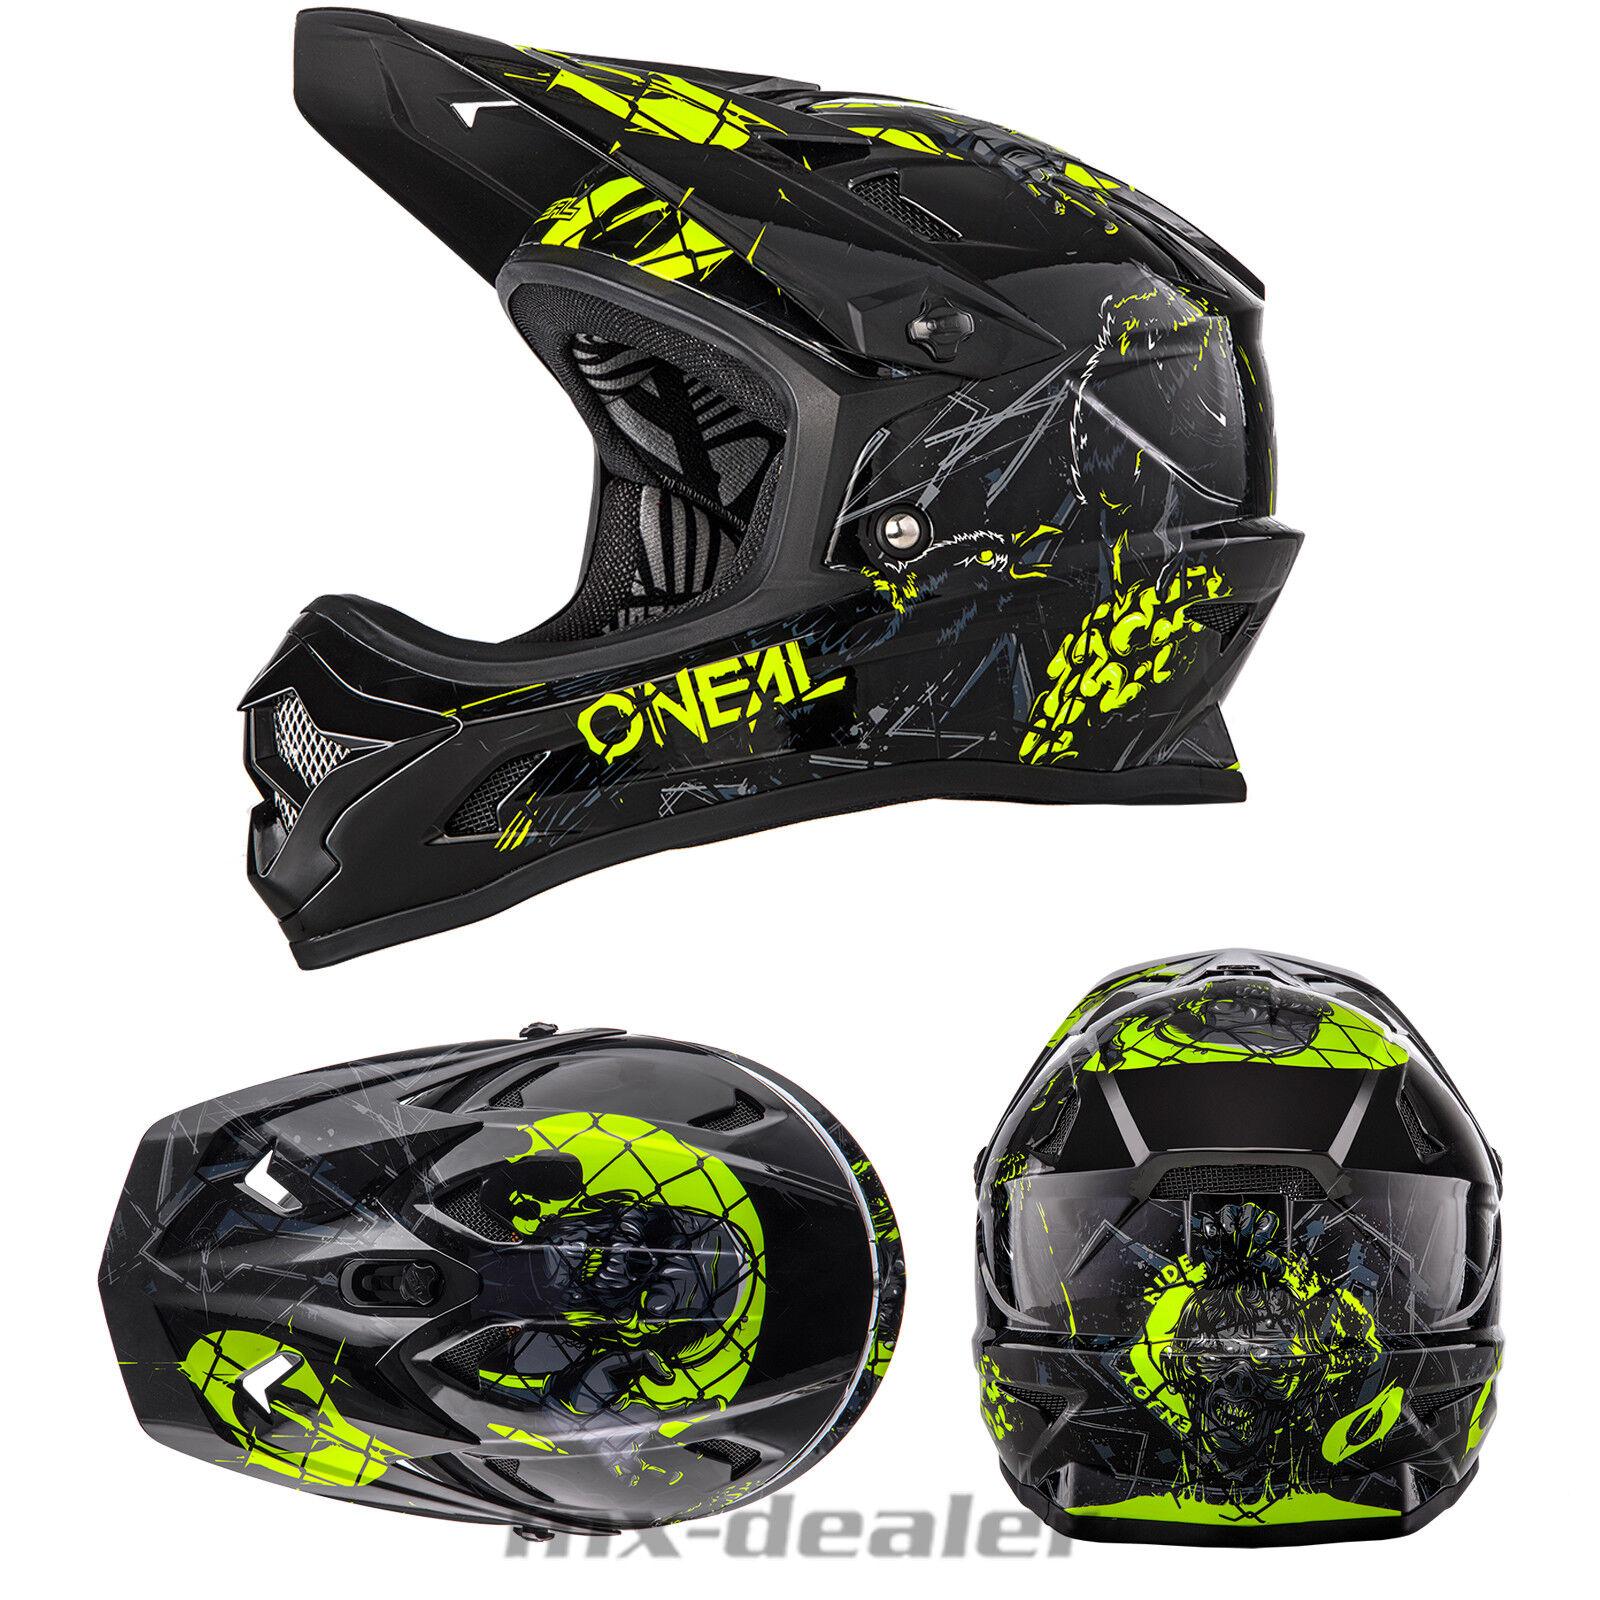 2019 oneal backflip RL 2 Zombie negro DH BMX Mountainbike MTB casco freeride